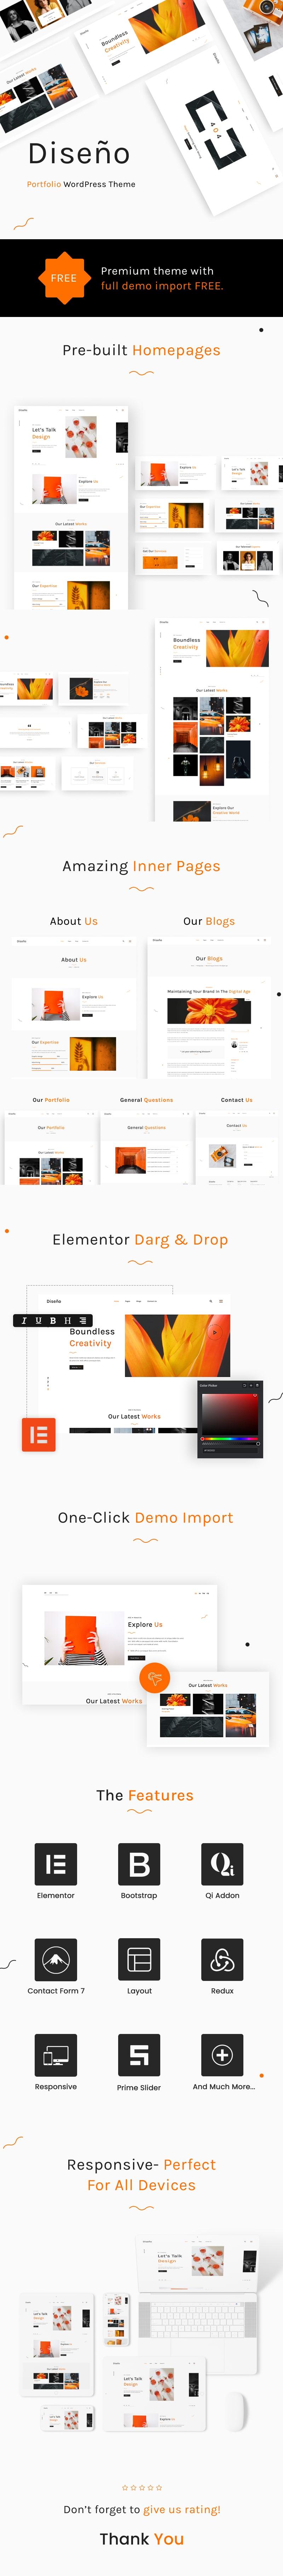 Best Free WordPress theme for Designer Portfolio | Diseno | Iqonic Design best free wordpress theme for designer portfolio Diseno WordPress Long 20Preview min